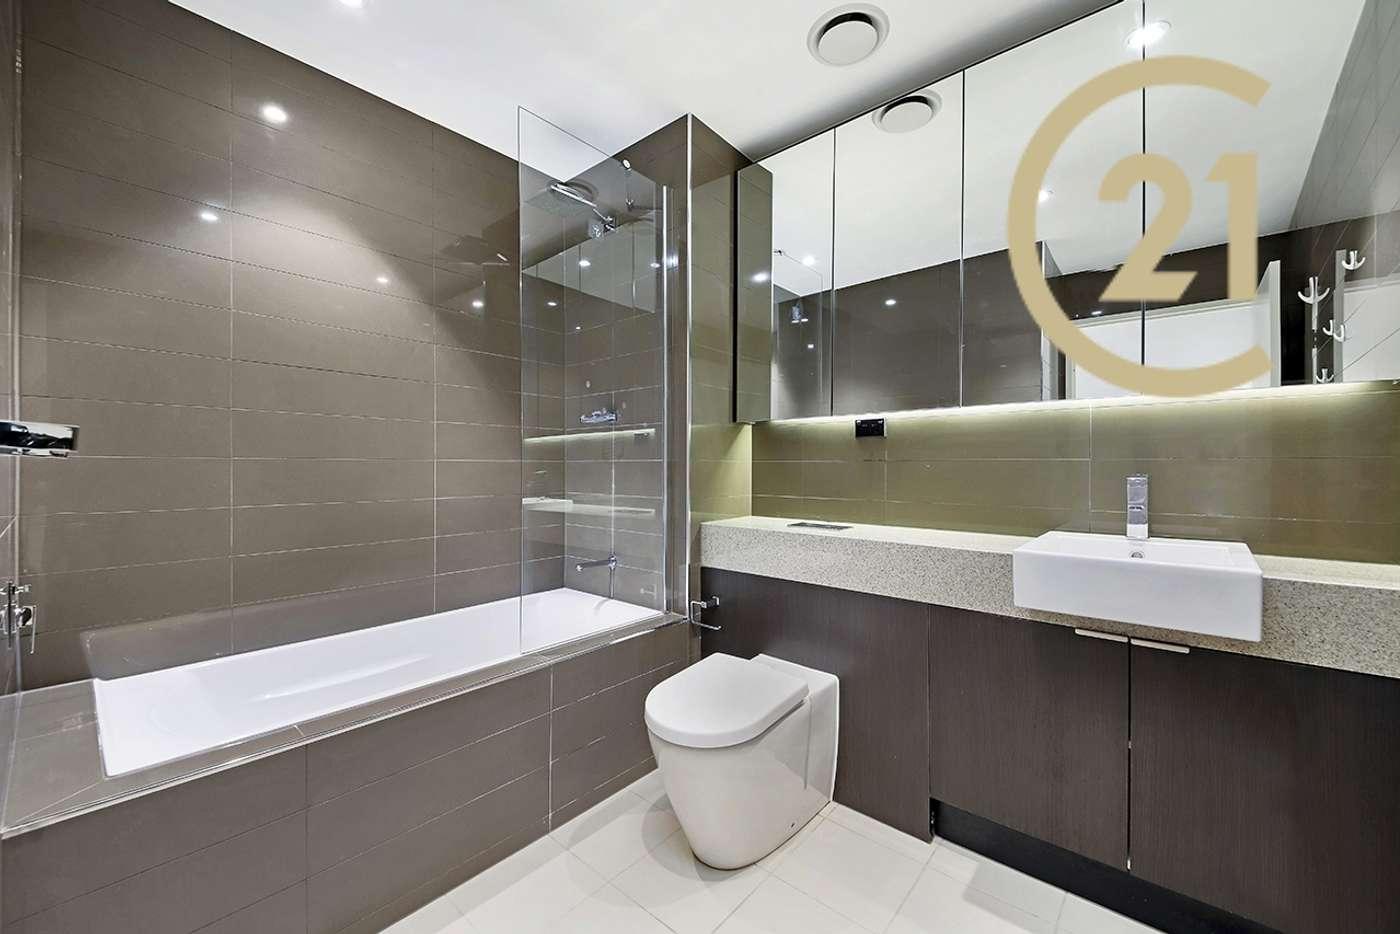 Sixth view of Homely apartment listing, 612/1 Lamond Lane, Zetland NSW 2017